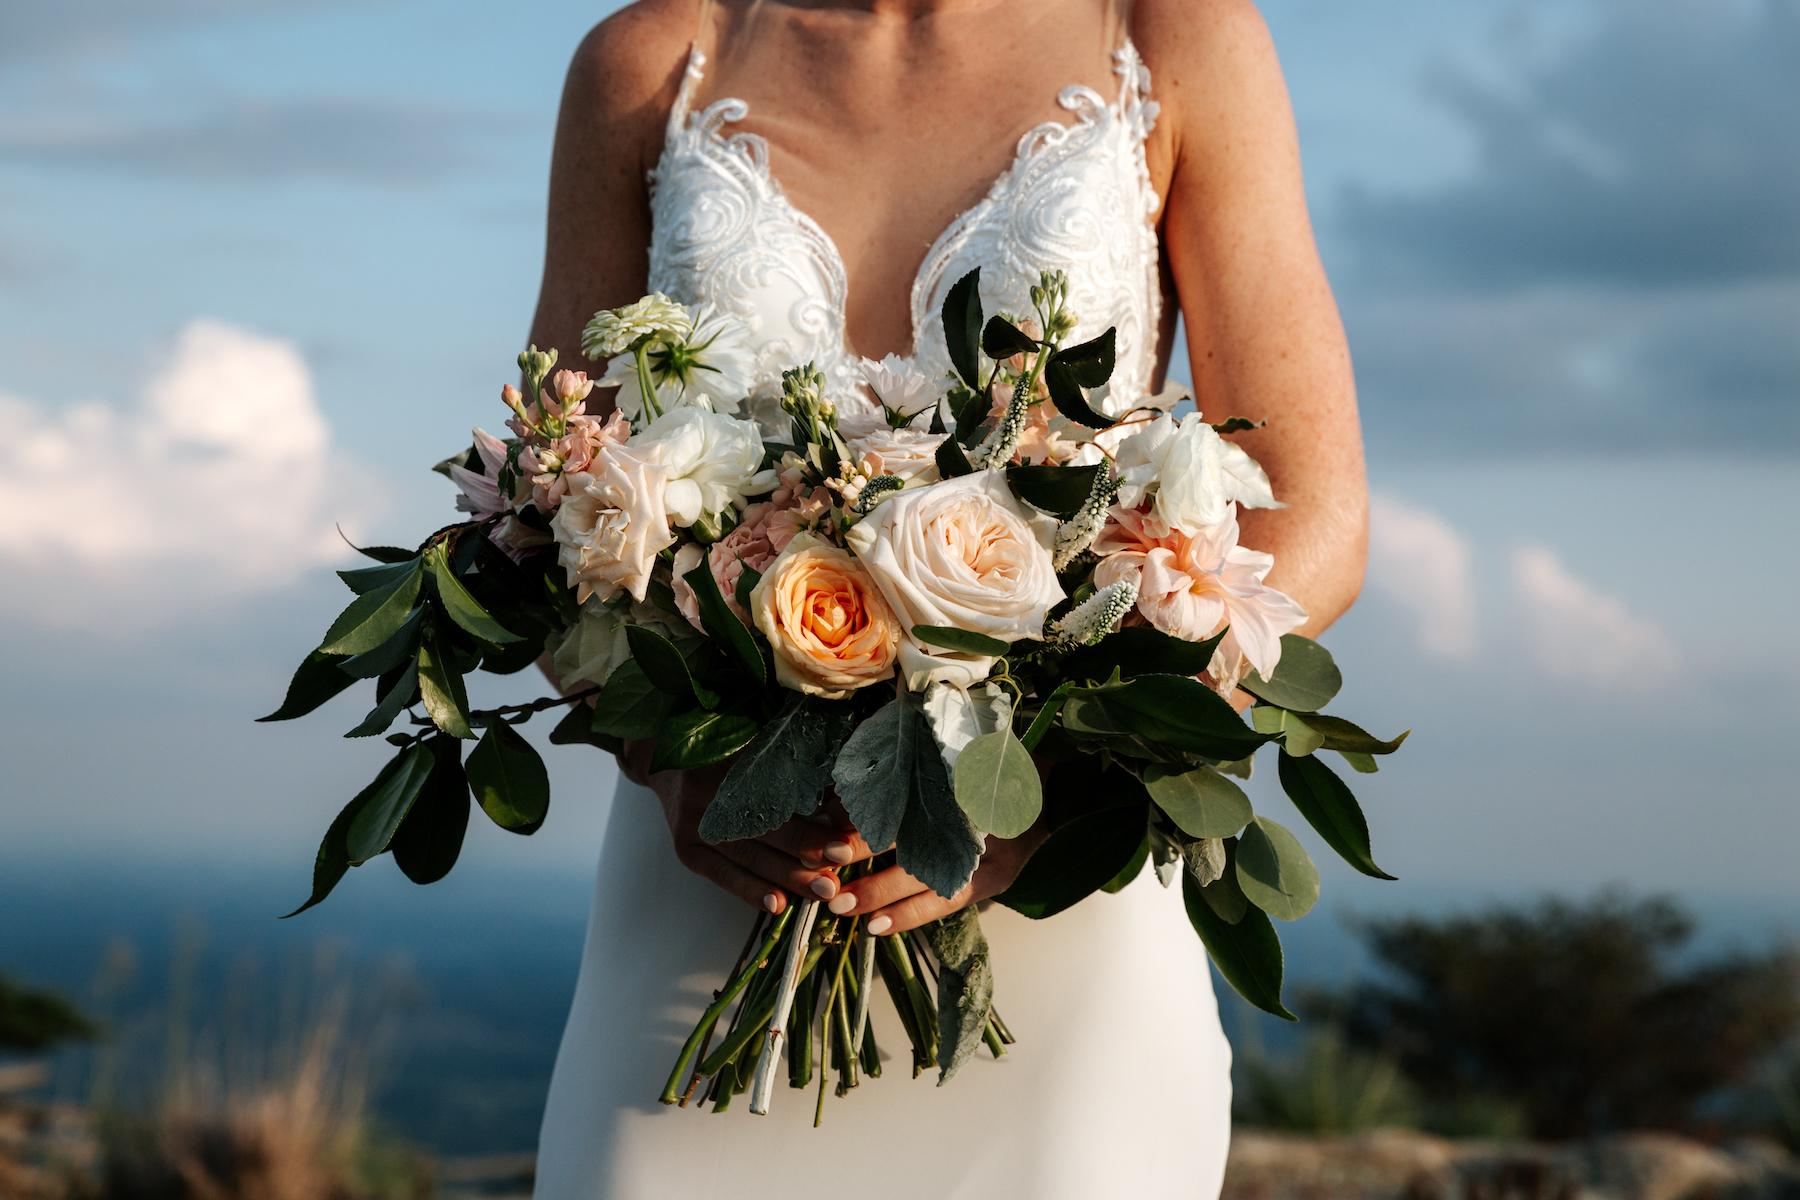 wedding-engagement-photographer-spartanburg-greenville-columbia-carolina-south-north-536.JPG